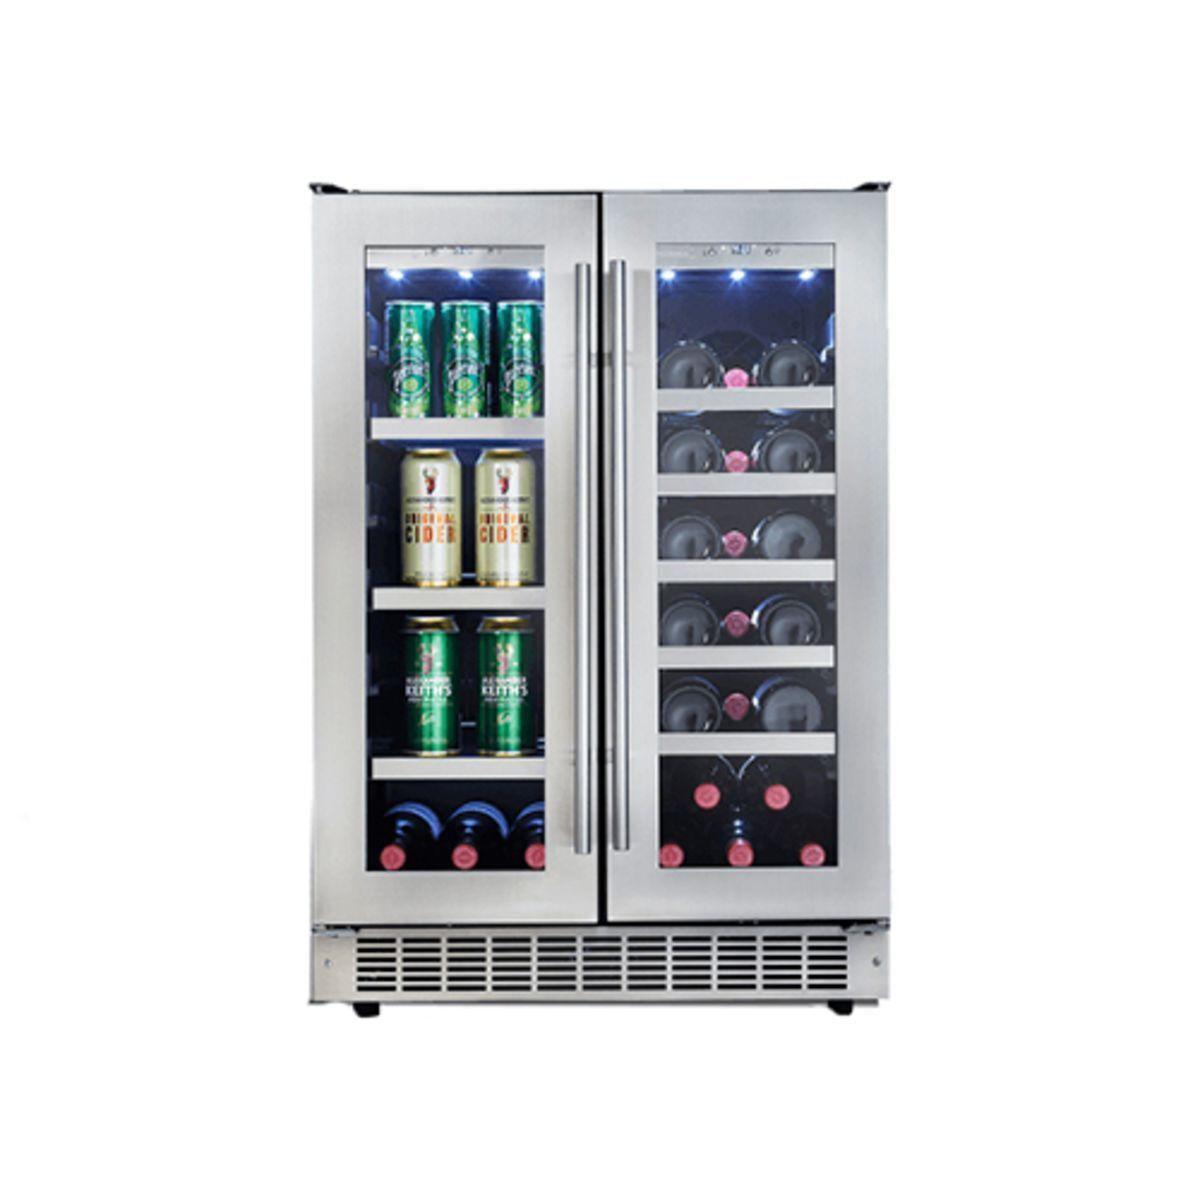 Danby dbc047d3 beverage center retro kitchen appliances